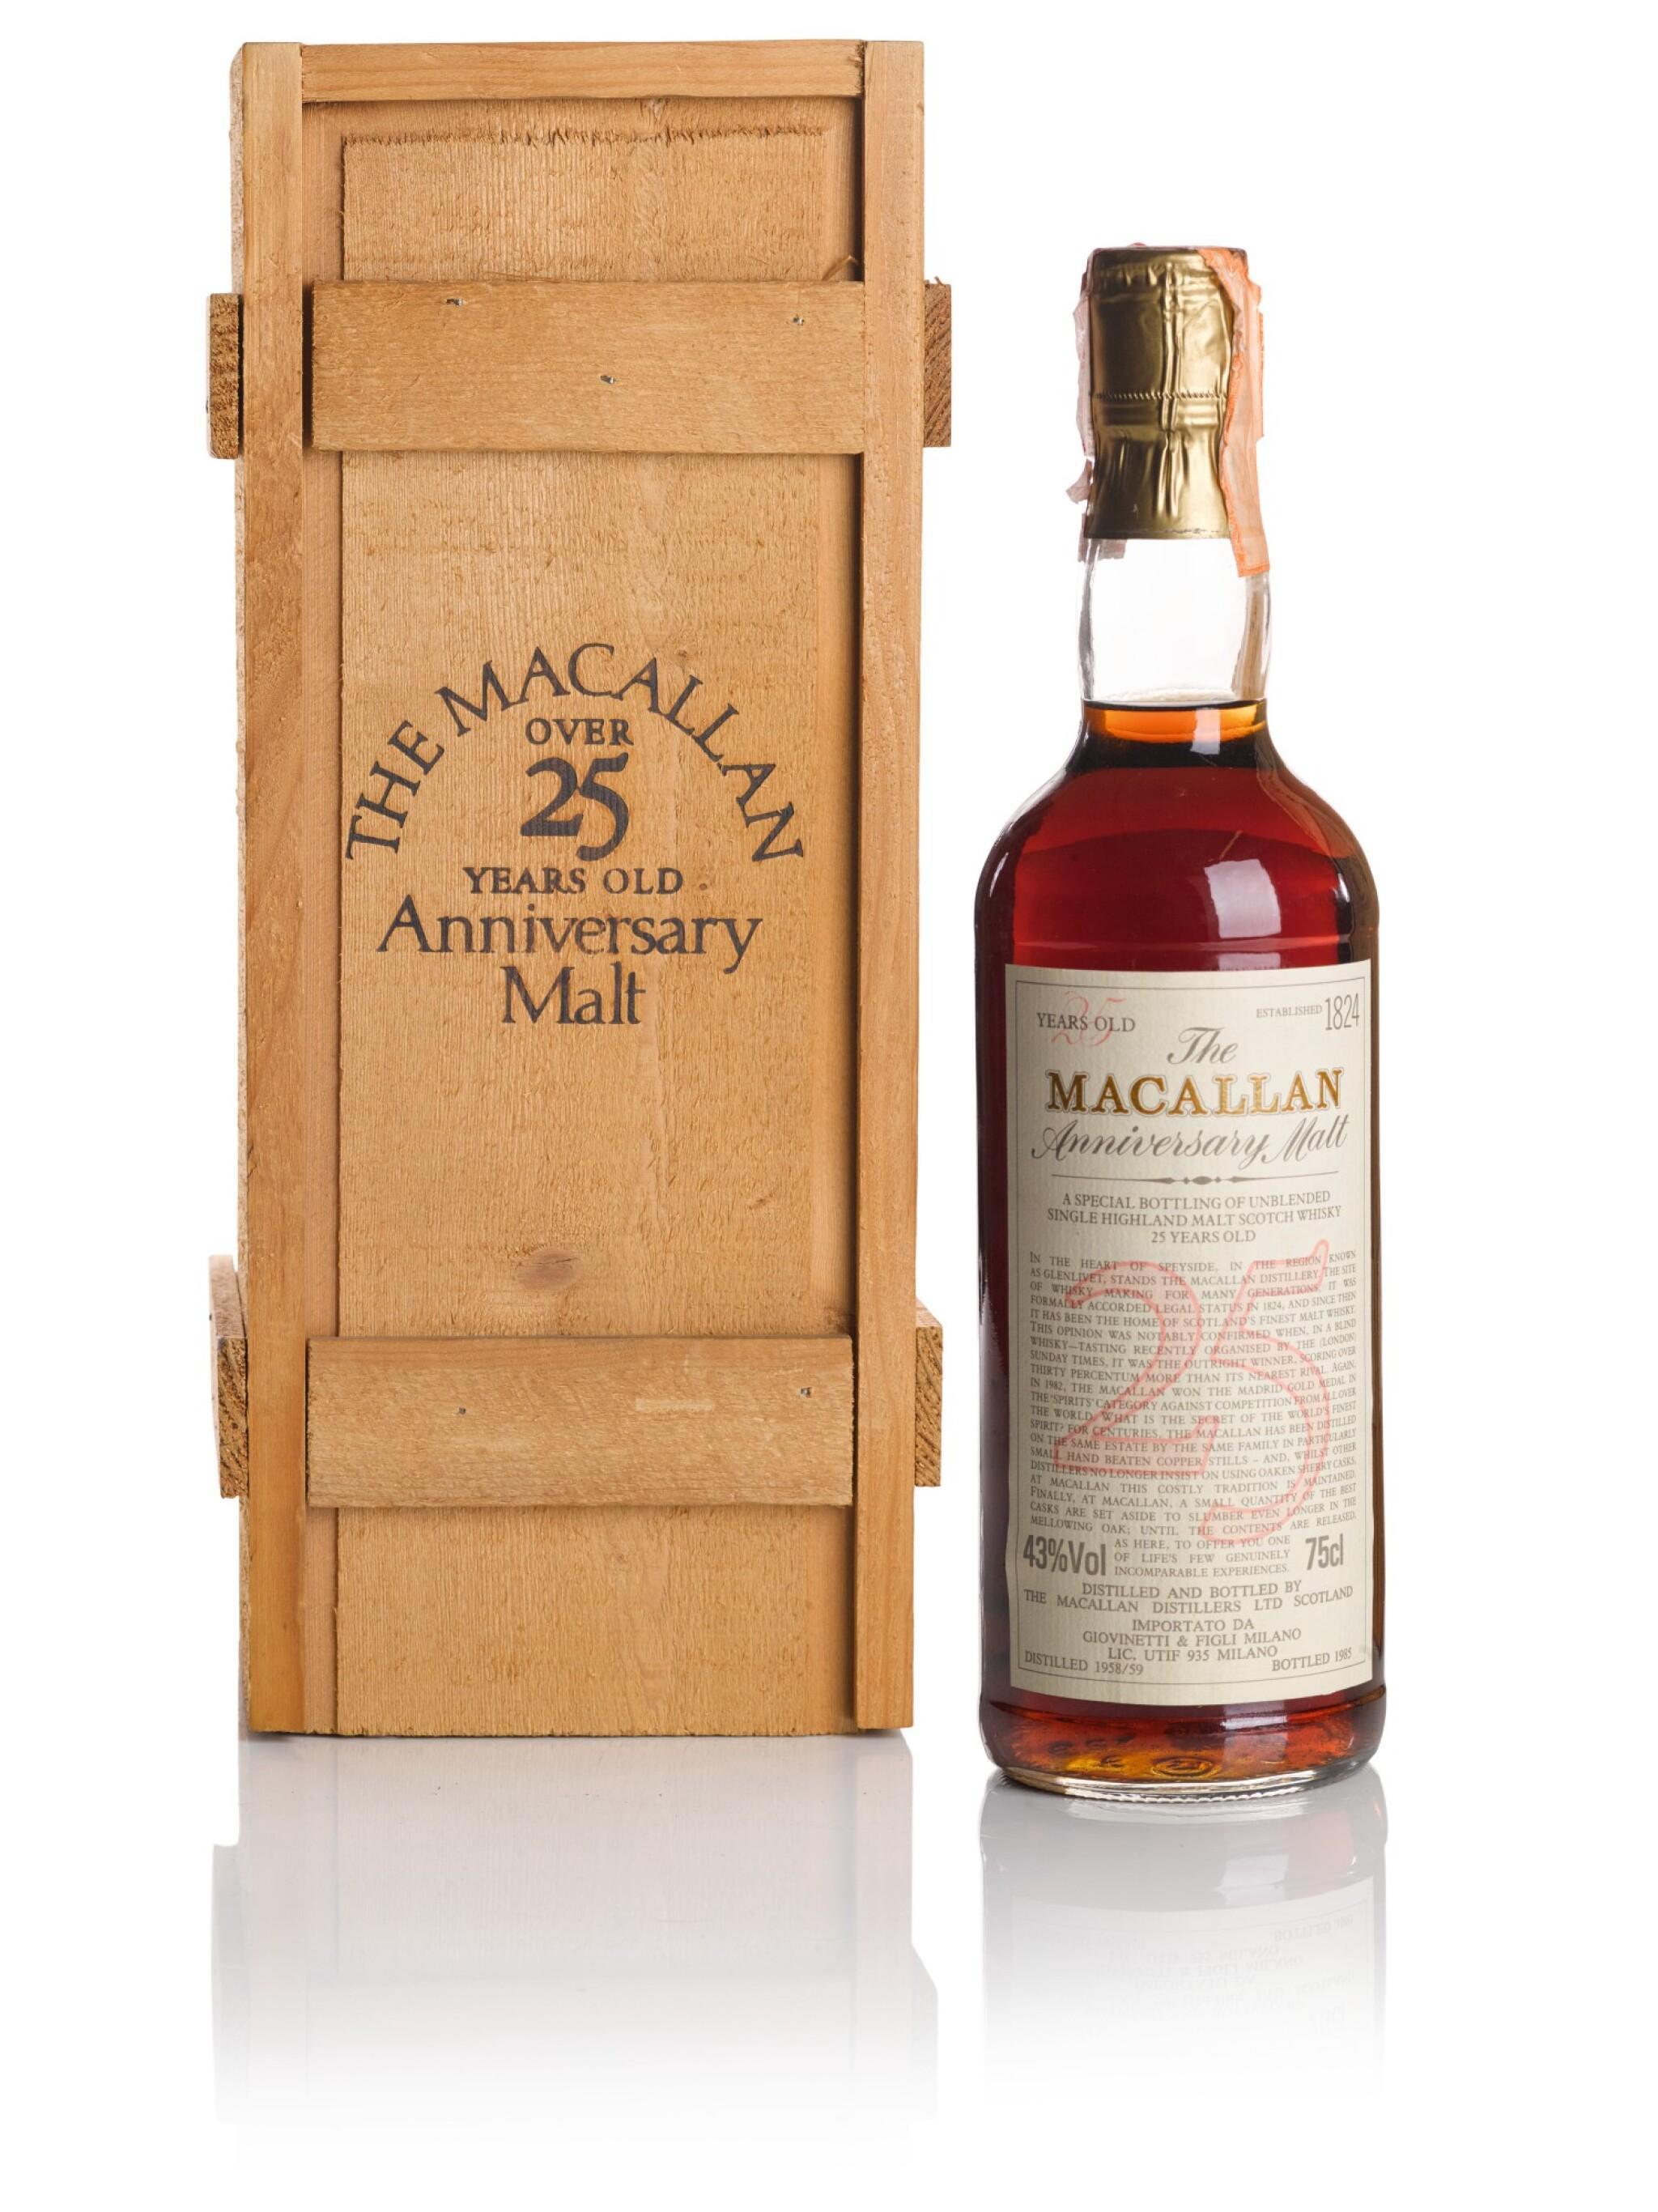 THE MACALLAN 25 YEAR OLD ANNIVERSARY MALT 43.0 ABV 1959